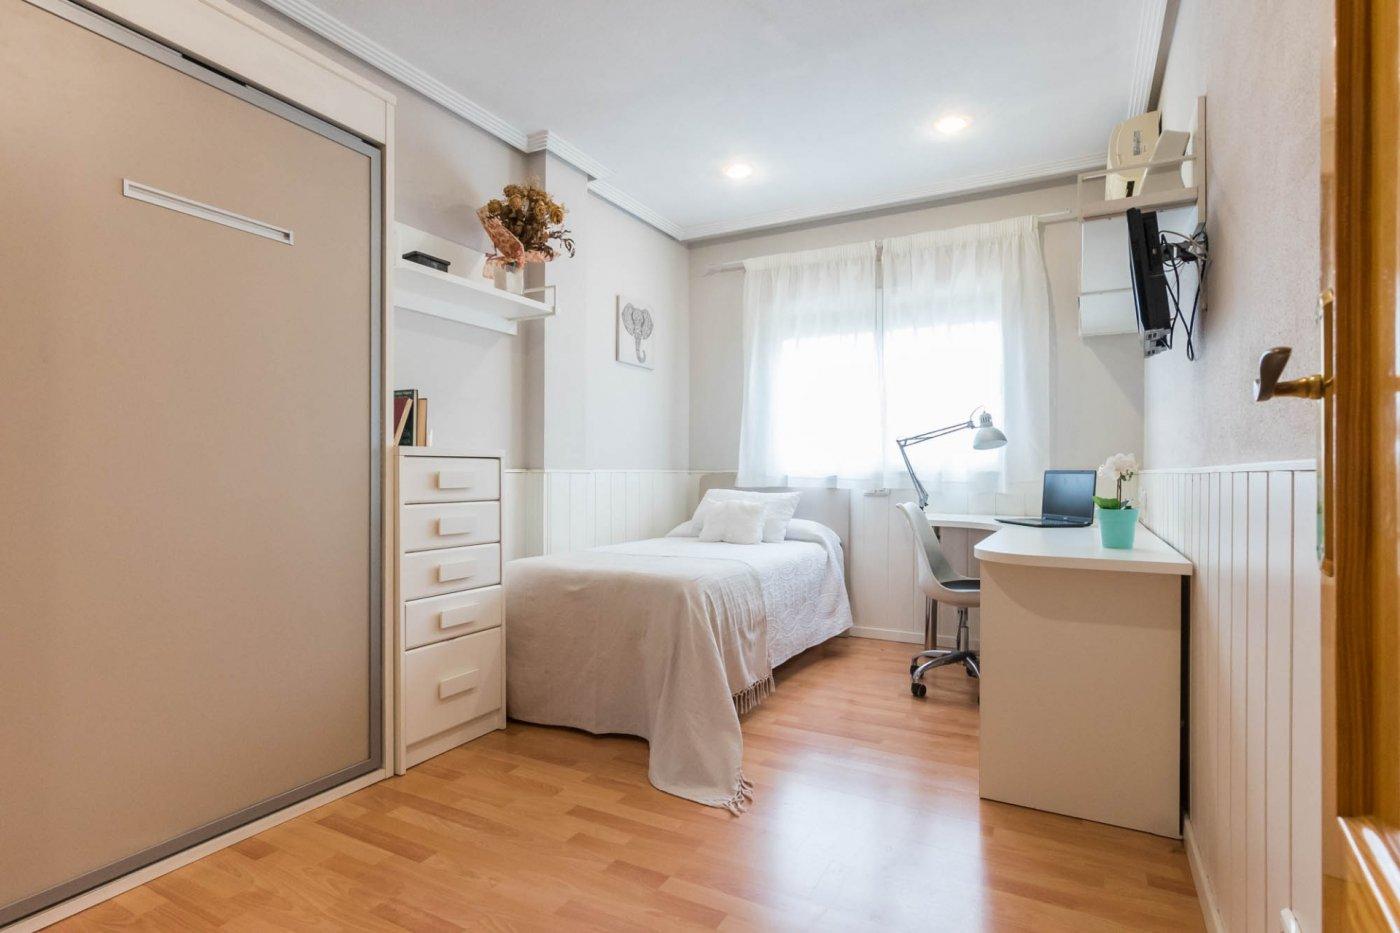 duplex en alcantarilla · alcantarilla 149900€